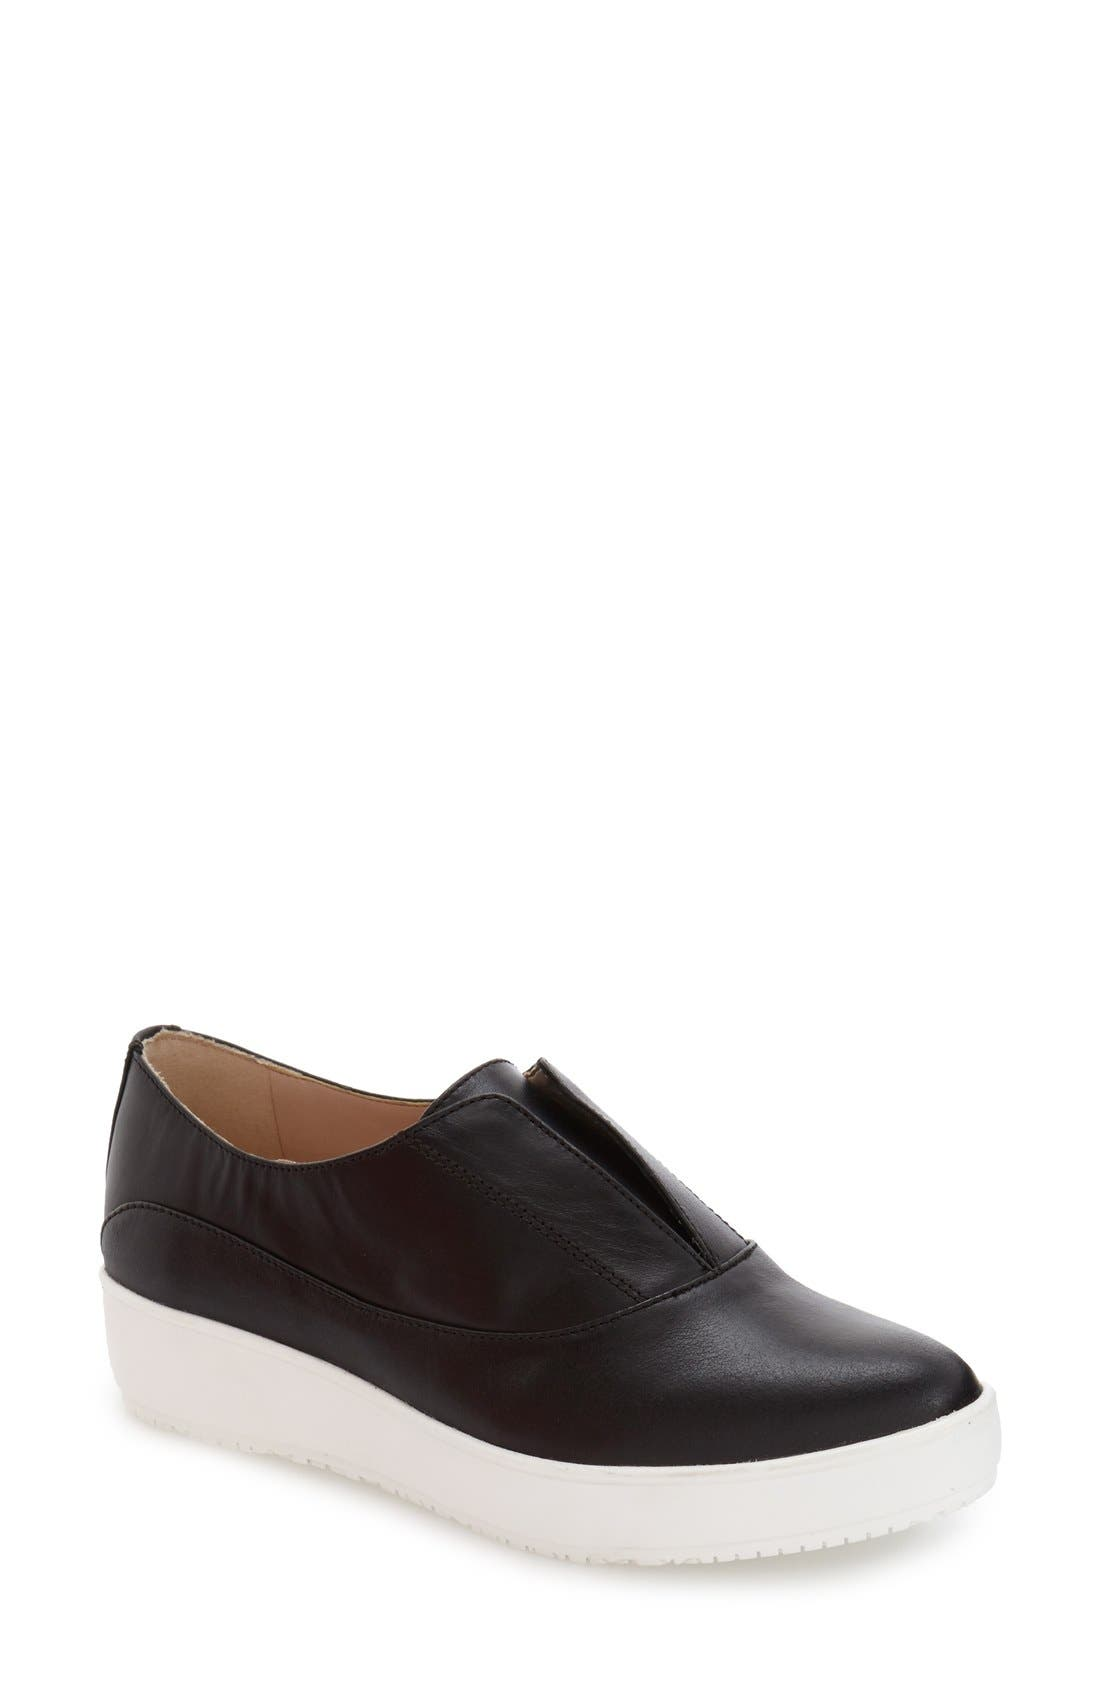 'Original Collection - Blakely' Laceless Platform Sneaker,                         Main,                         color, 001